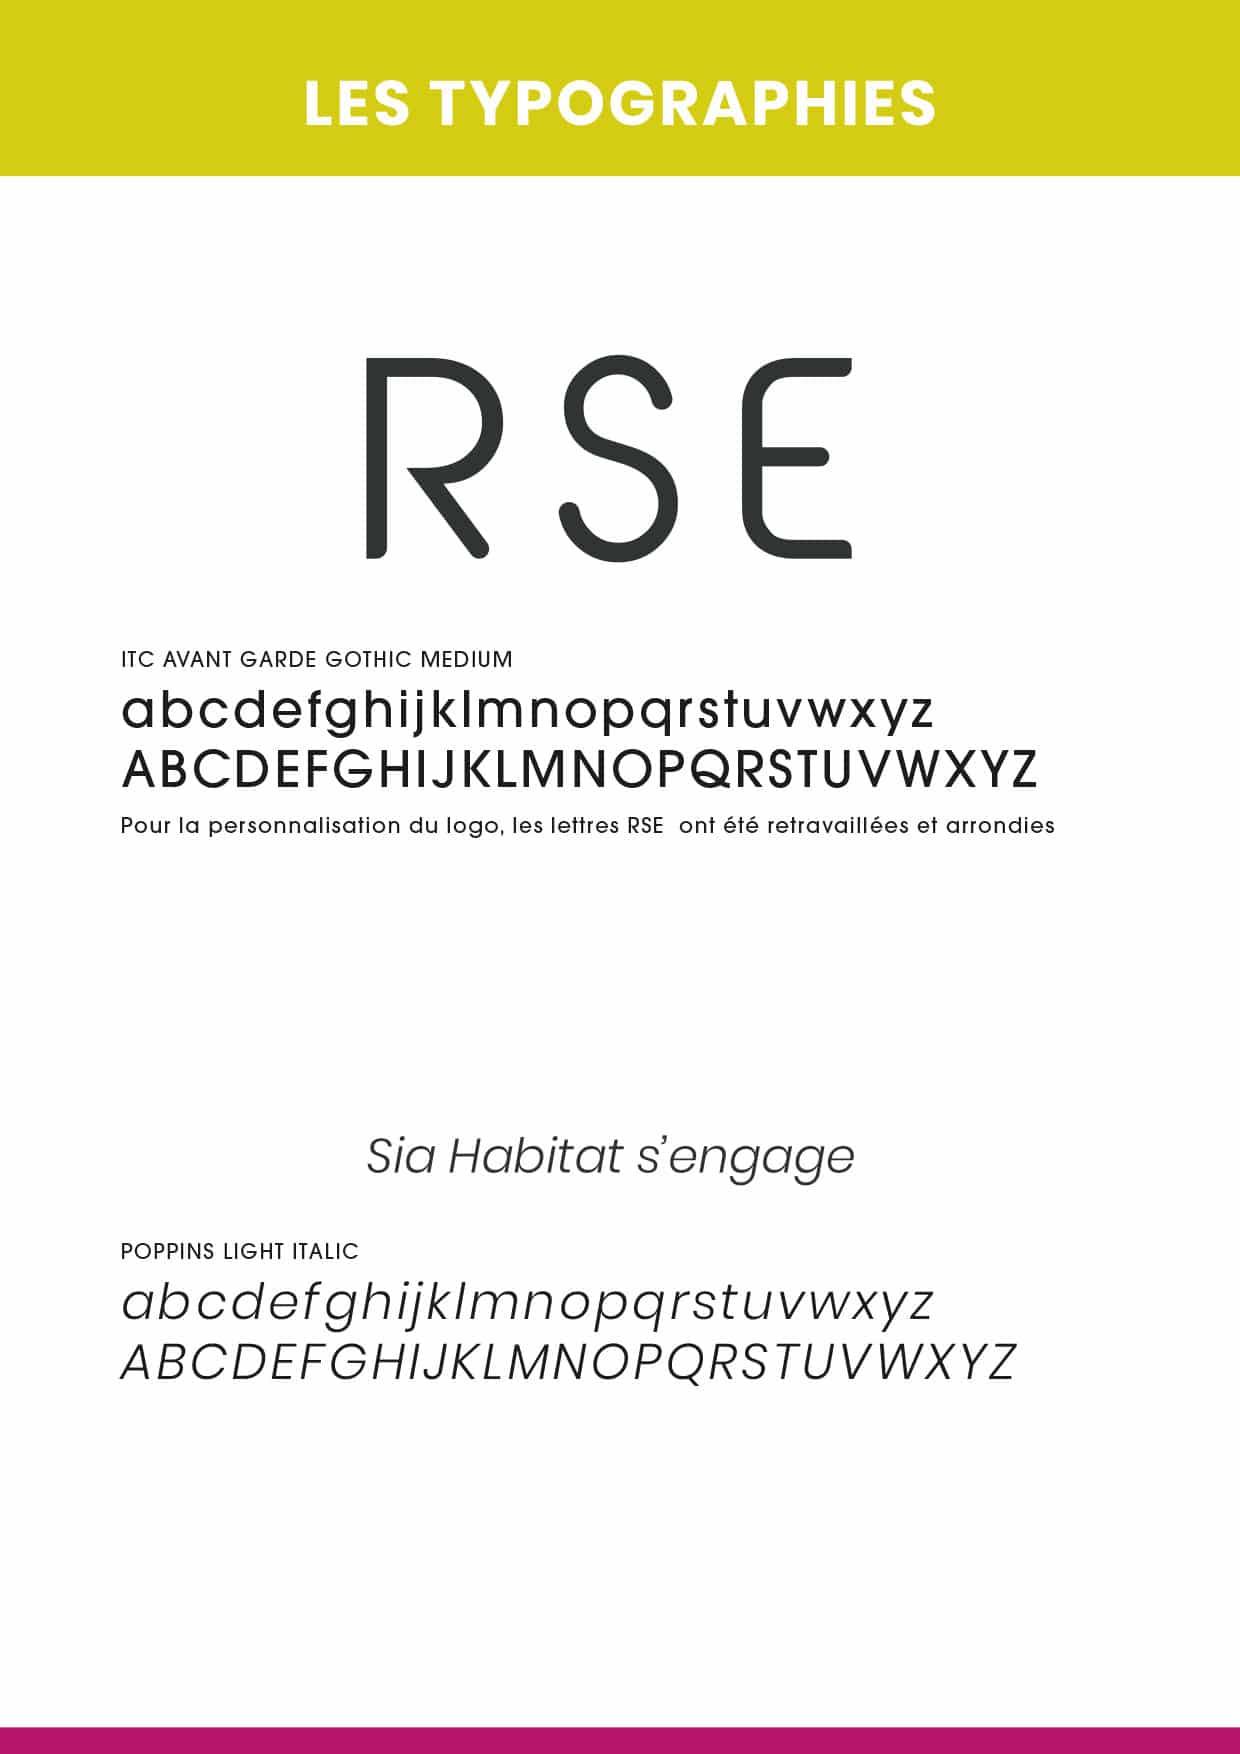 typographie : charte graphique logo RSE - SIA Habitat